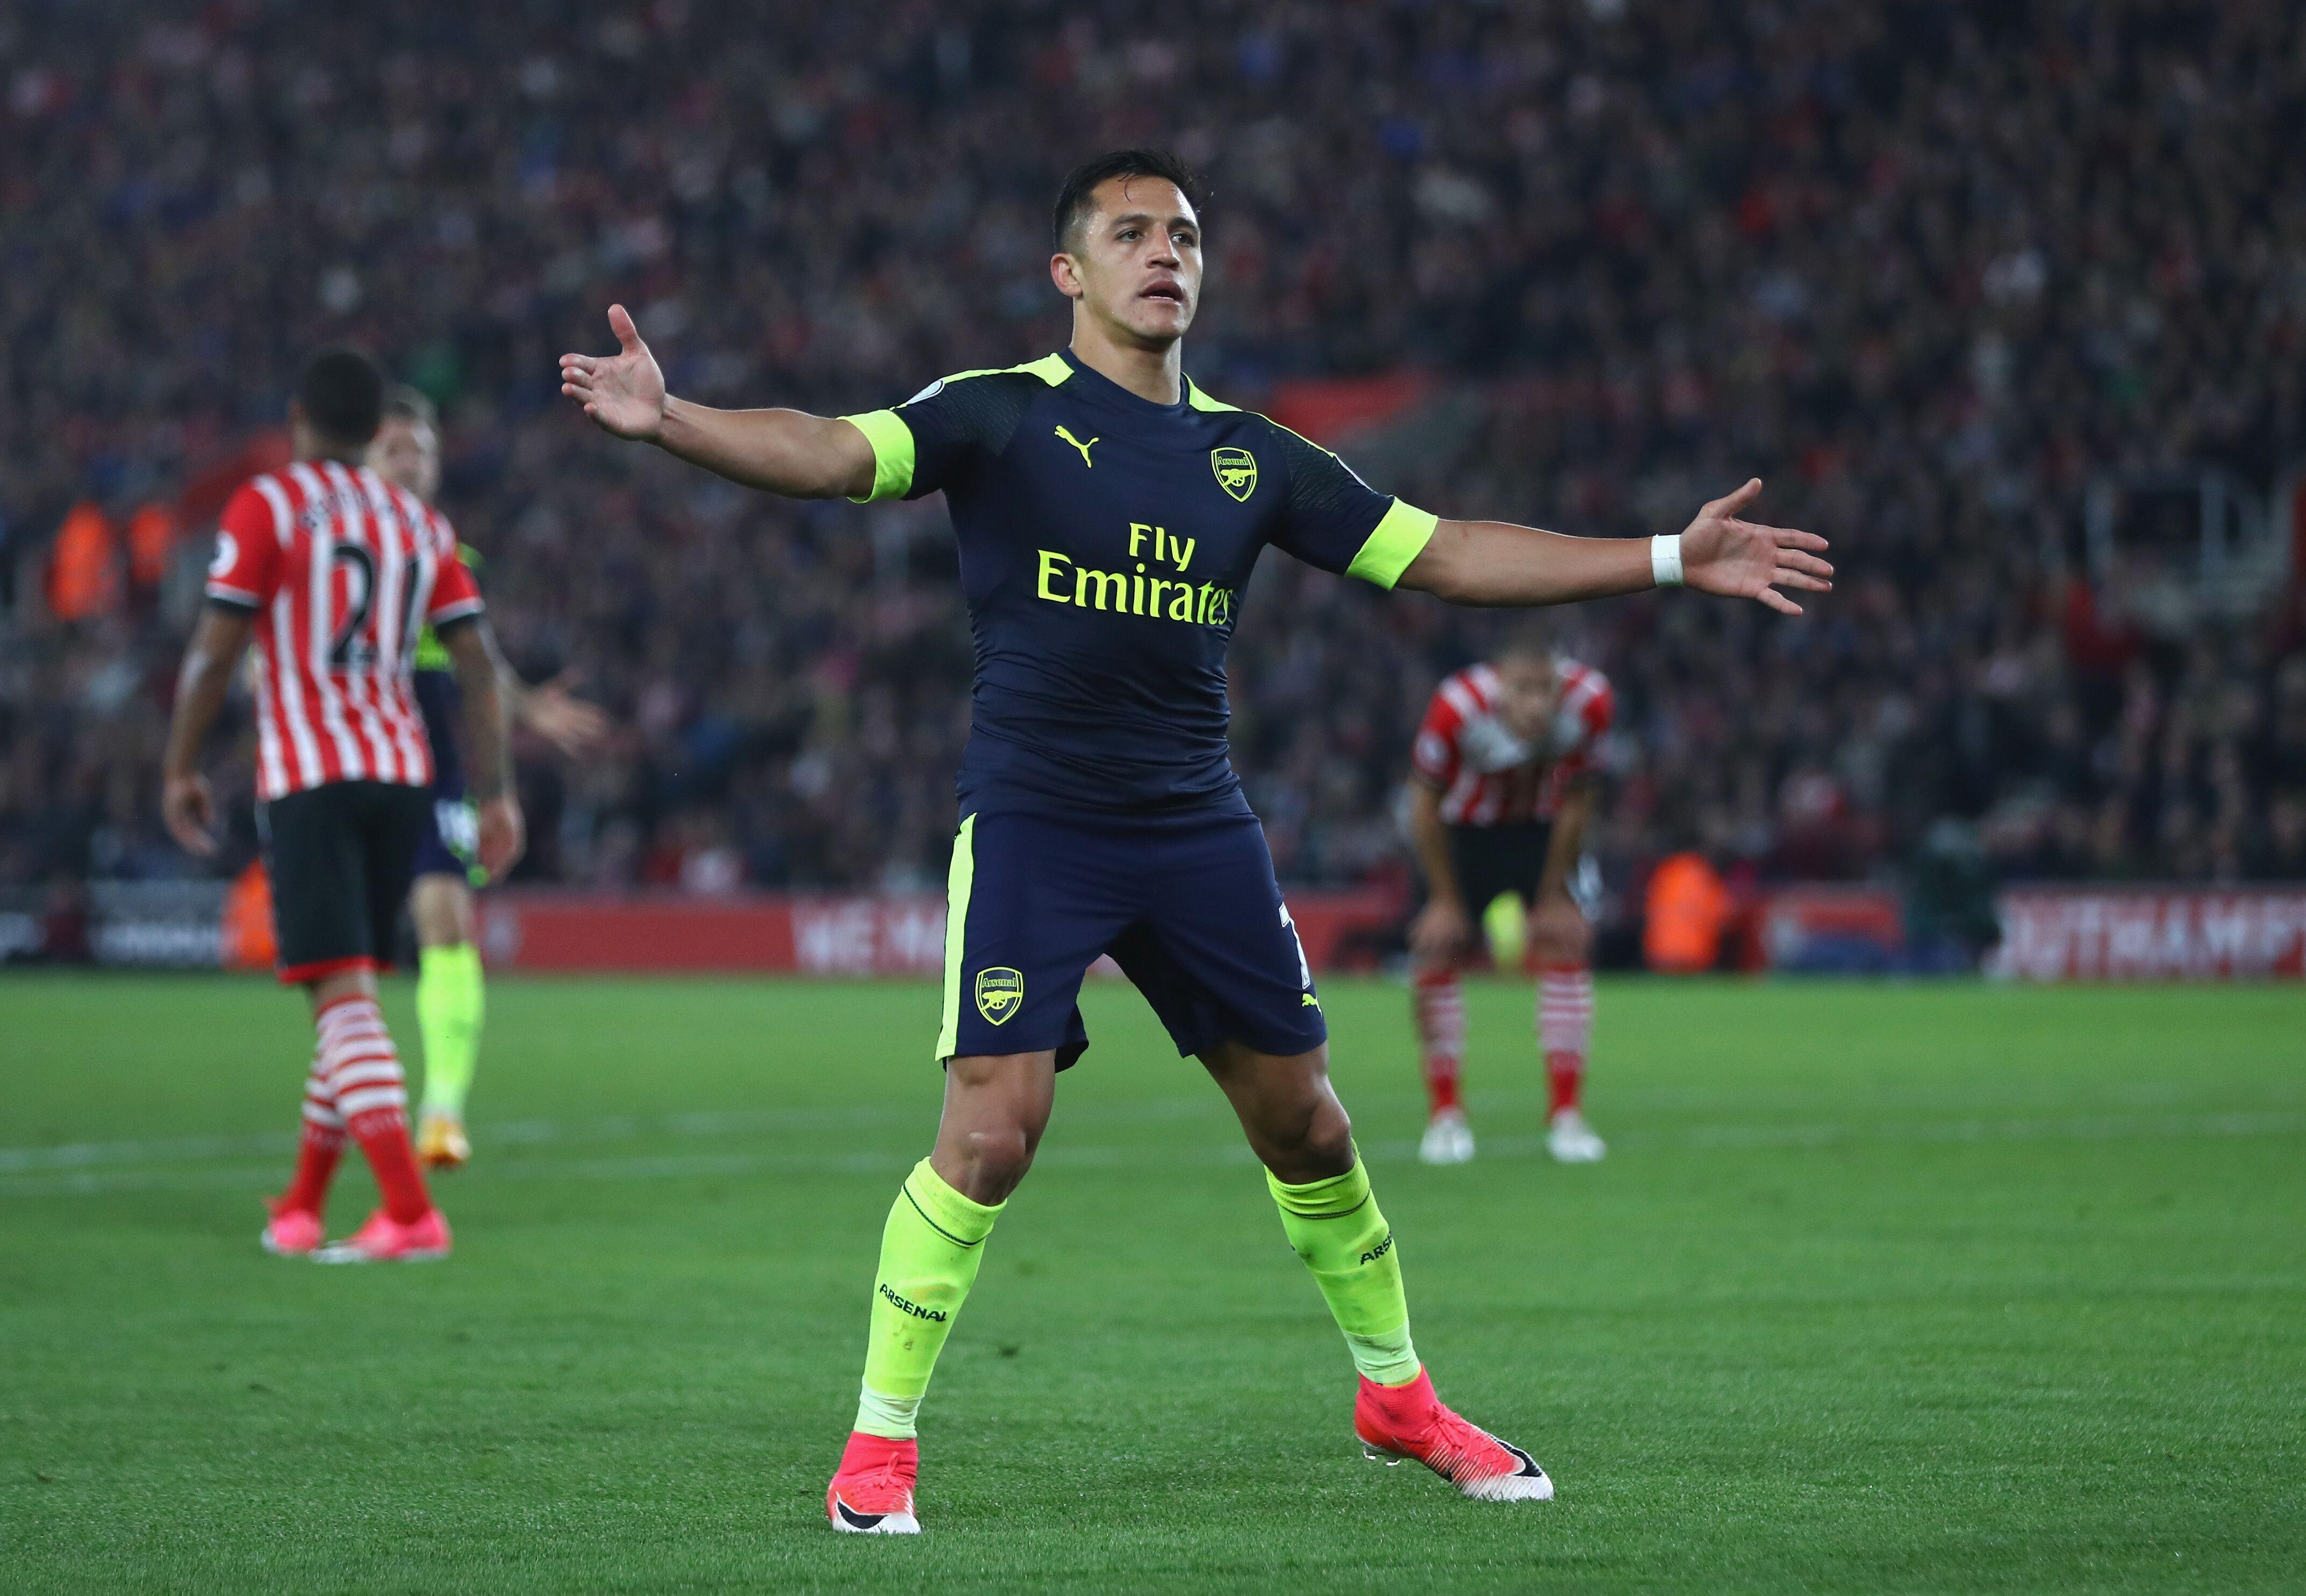 Southampton England May  Alexis Sanchez Of Arsenal Celebrates Scoring The Opening Goal